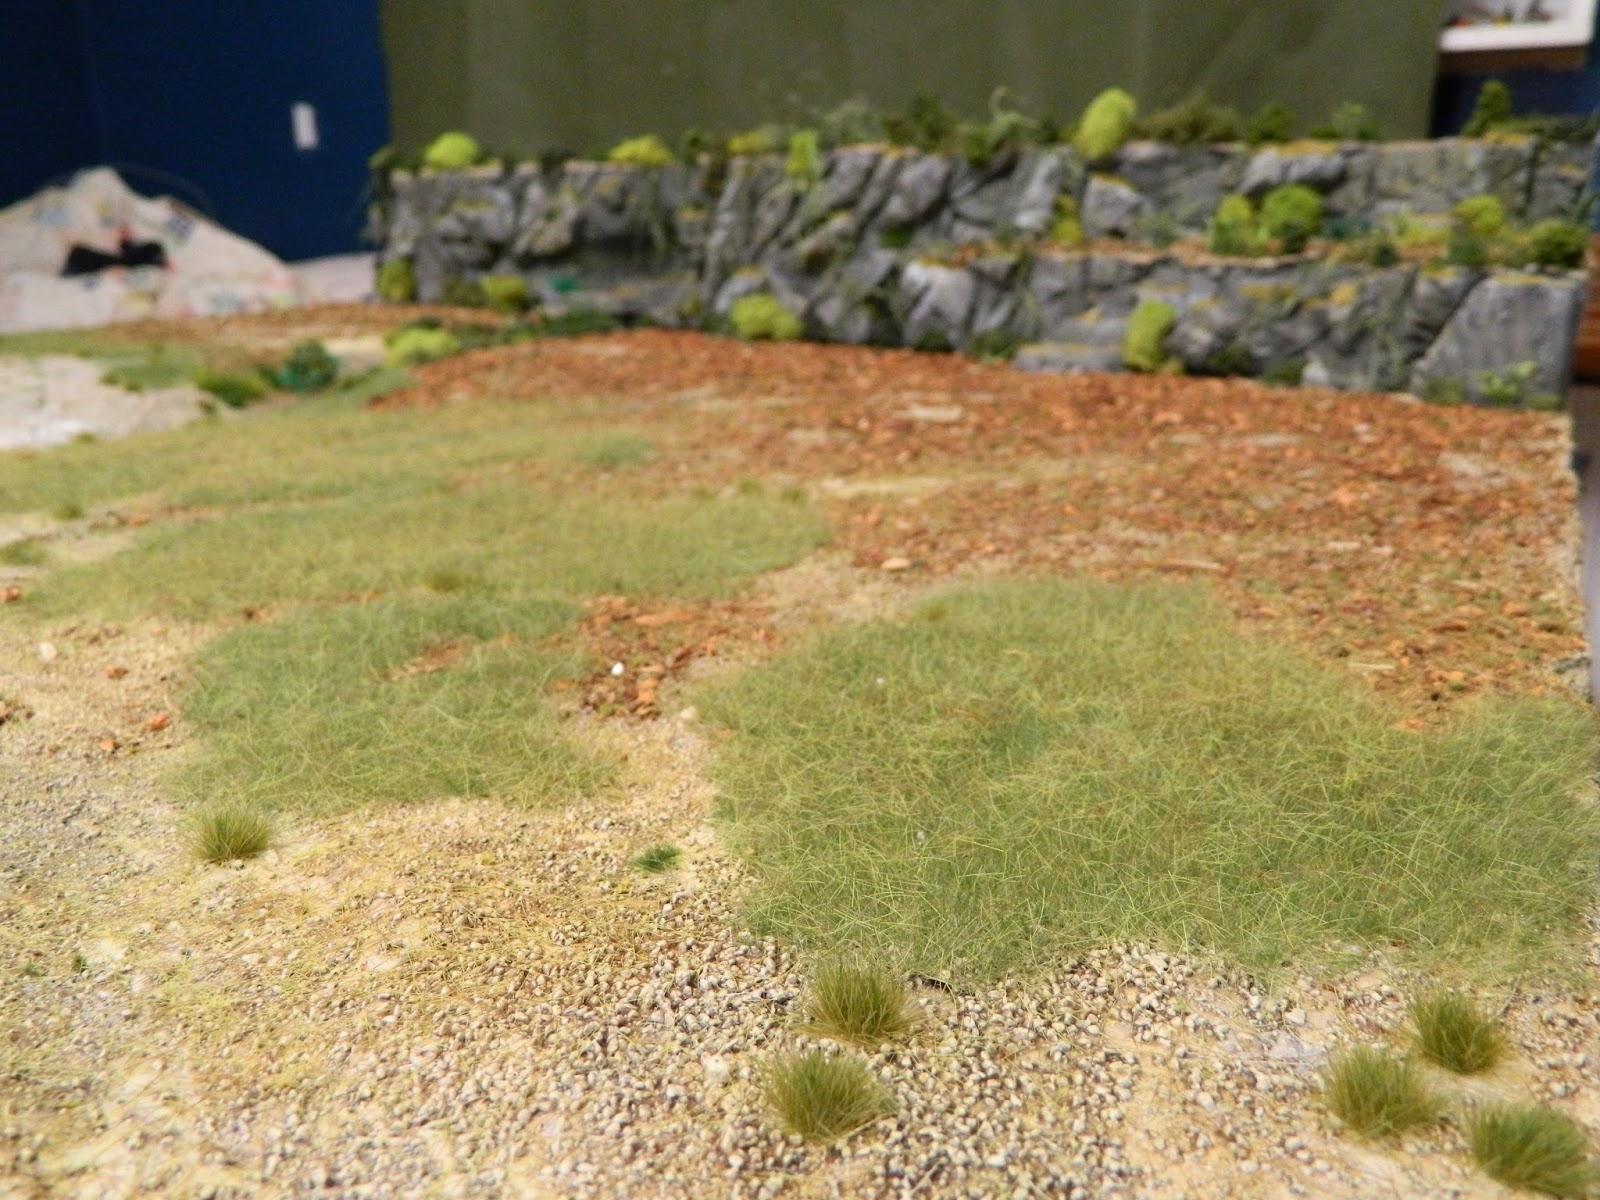 Not exactly Mordheim terrain Pulp%2BAlley%2BTable%2B1%2BNov%2B13%2B001